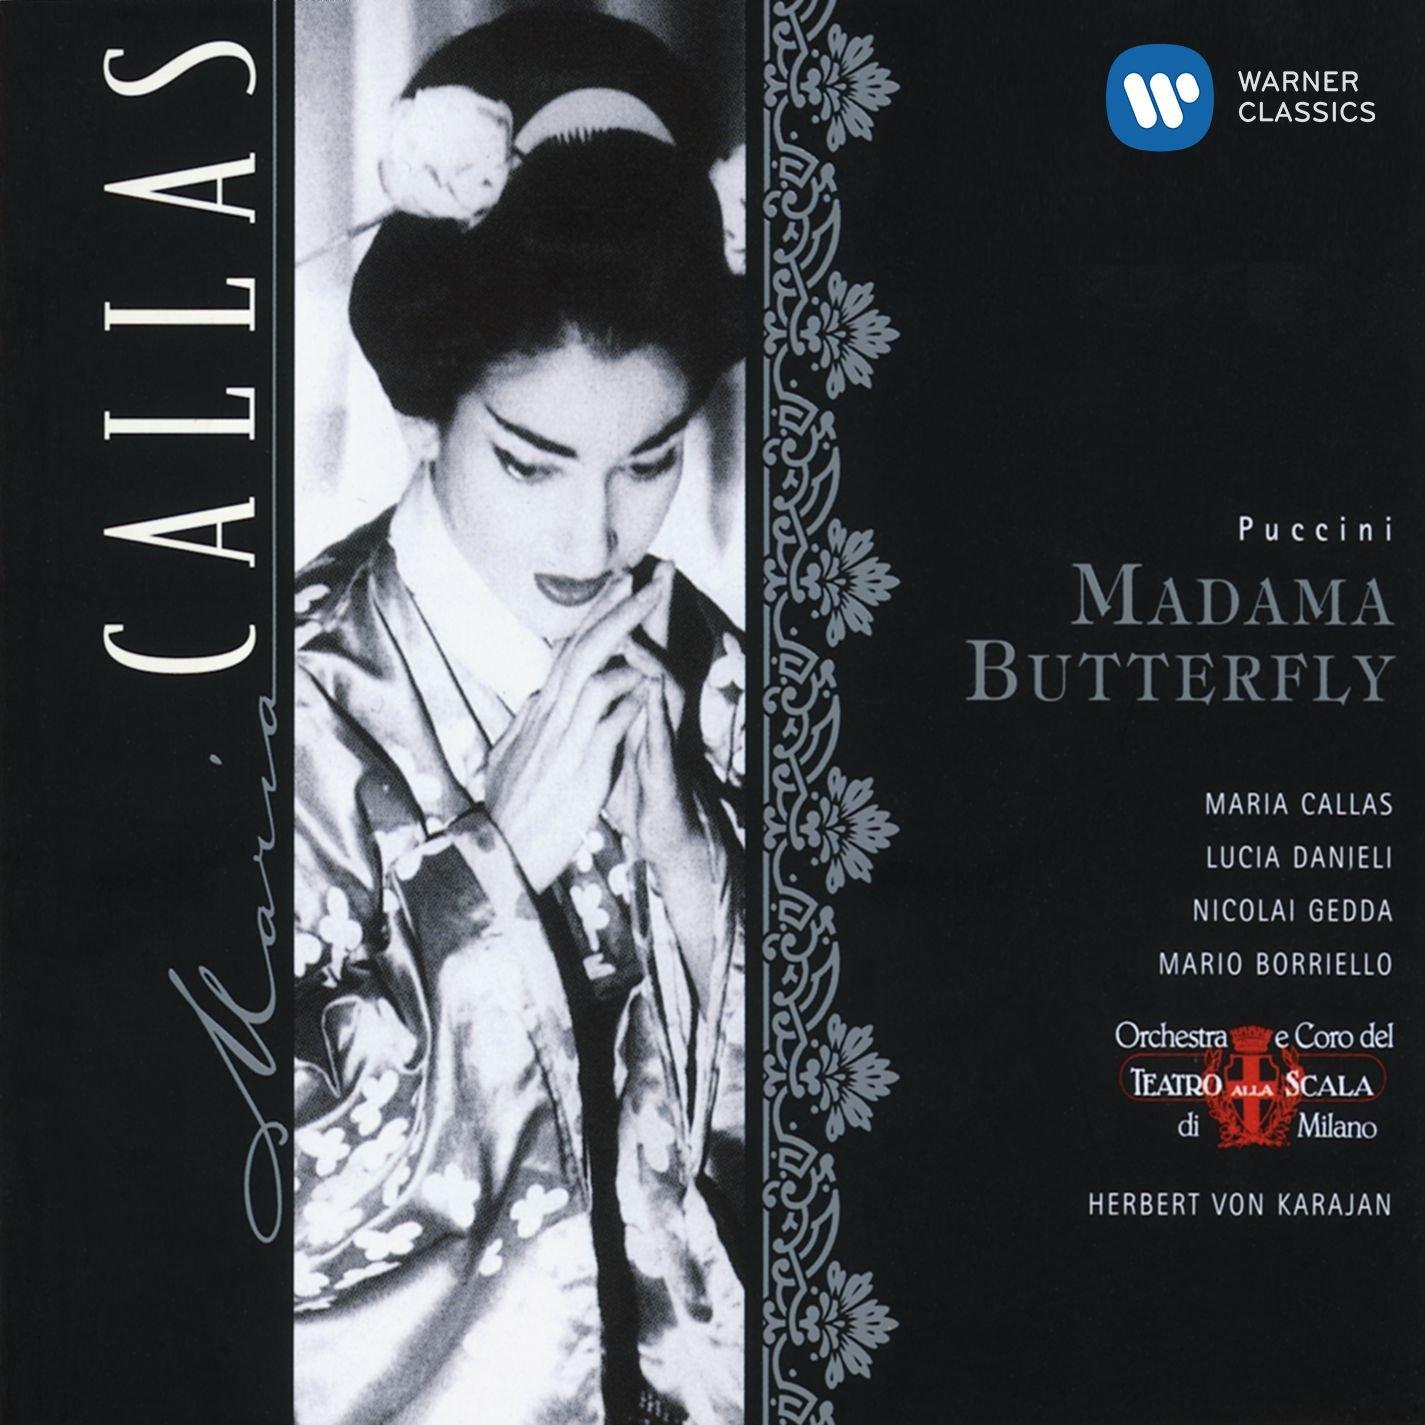 Puccini: Madama Butterfly (complete opera) with Maria Callas, Lucia Danieli, Nicolai Gedda, Herbert von Karajan, Chorus & Orchestra of La Scala, Milan